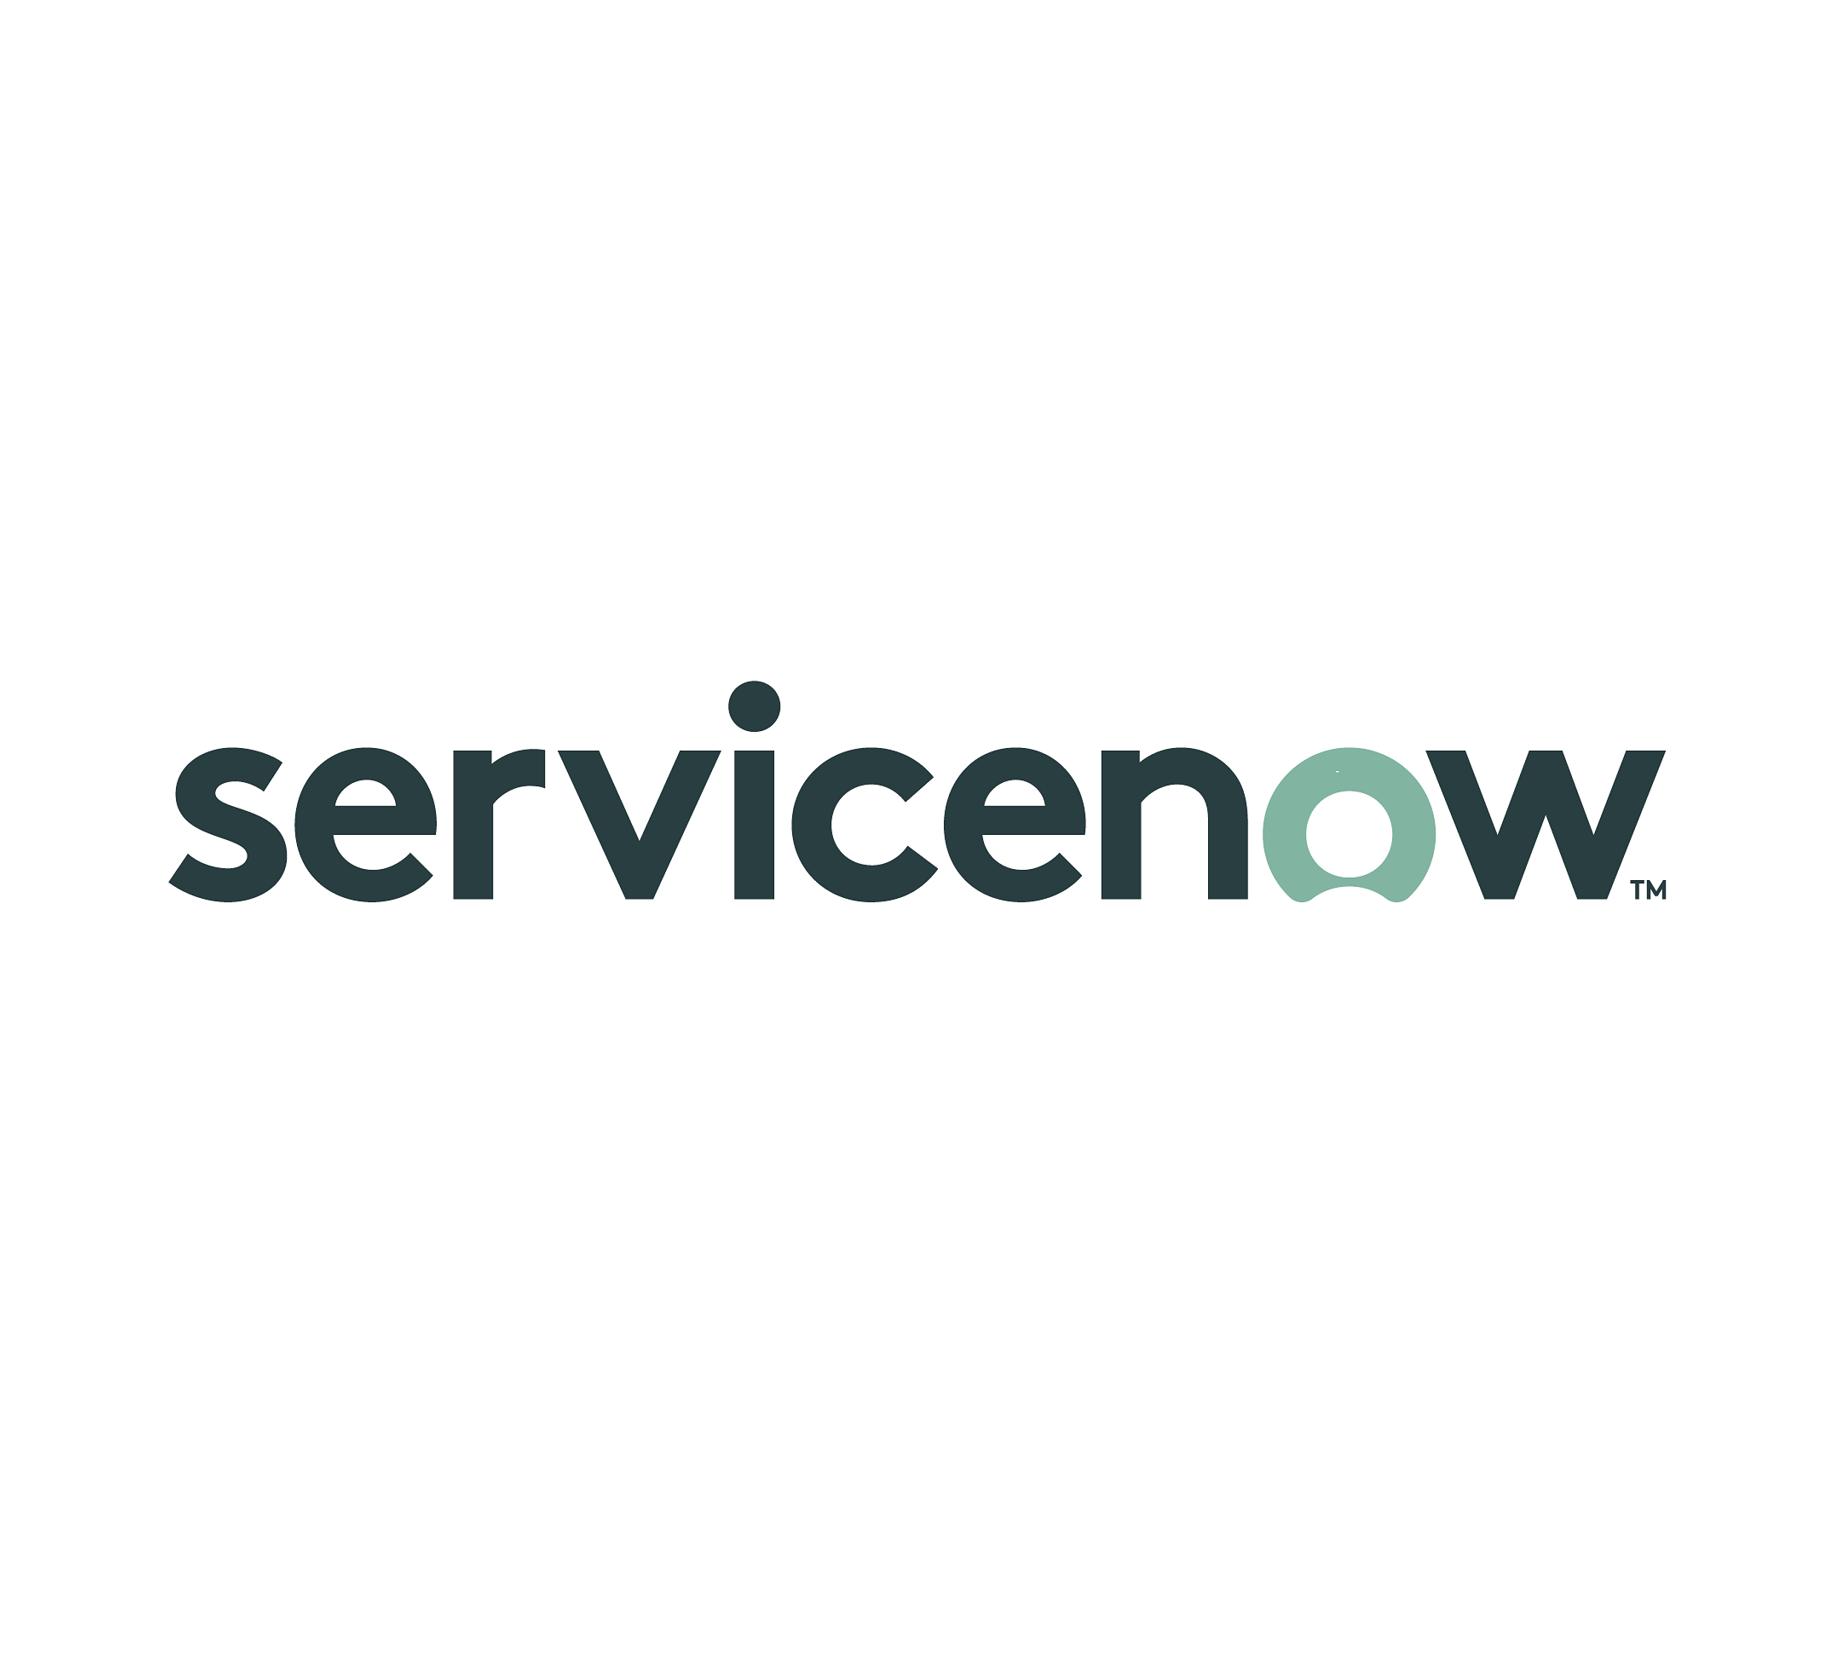 nowforum-nowsummit-servicenow.png